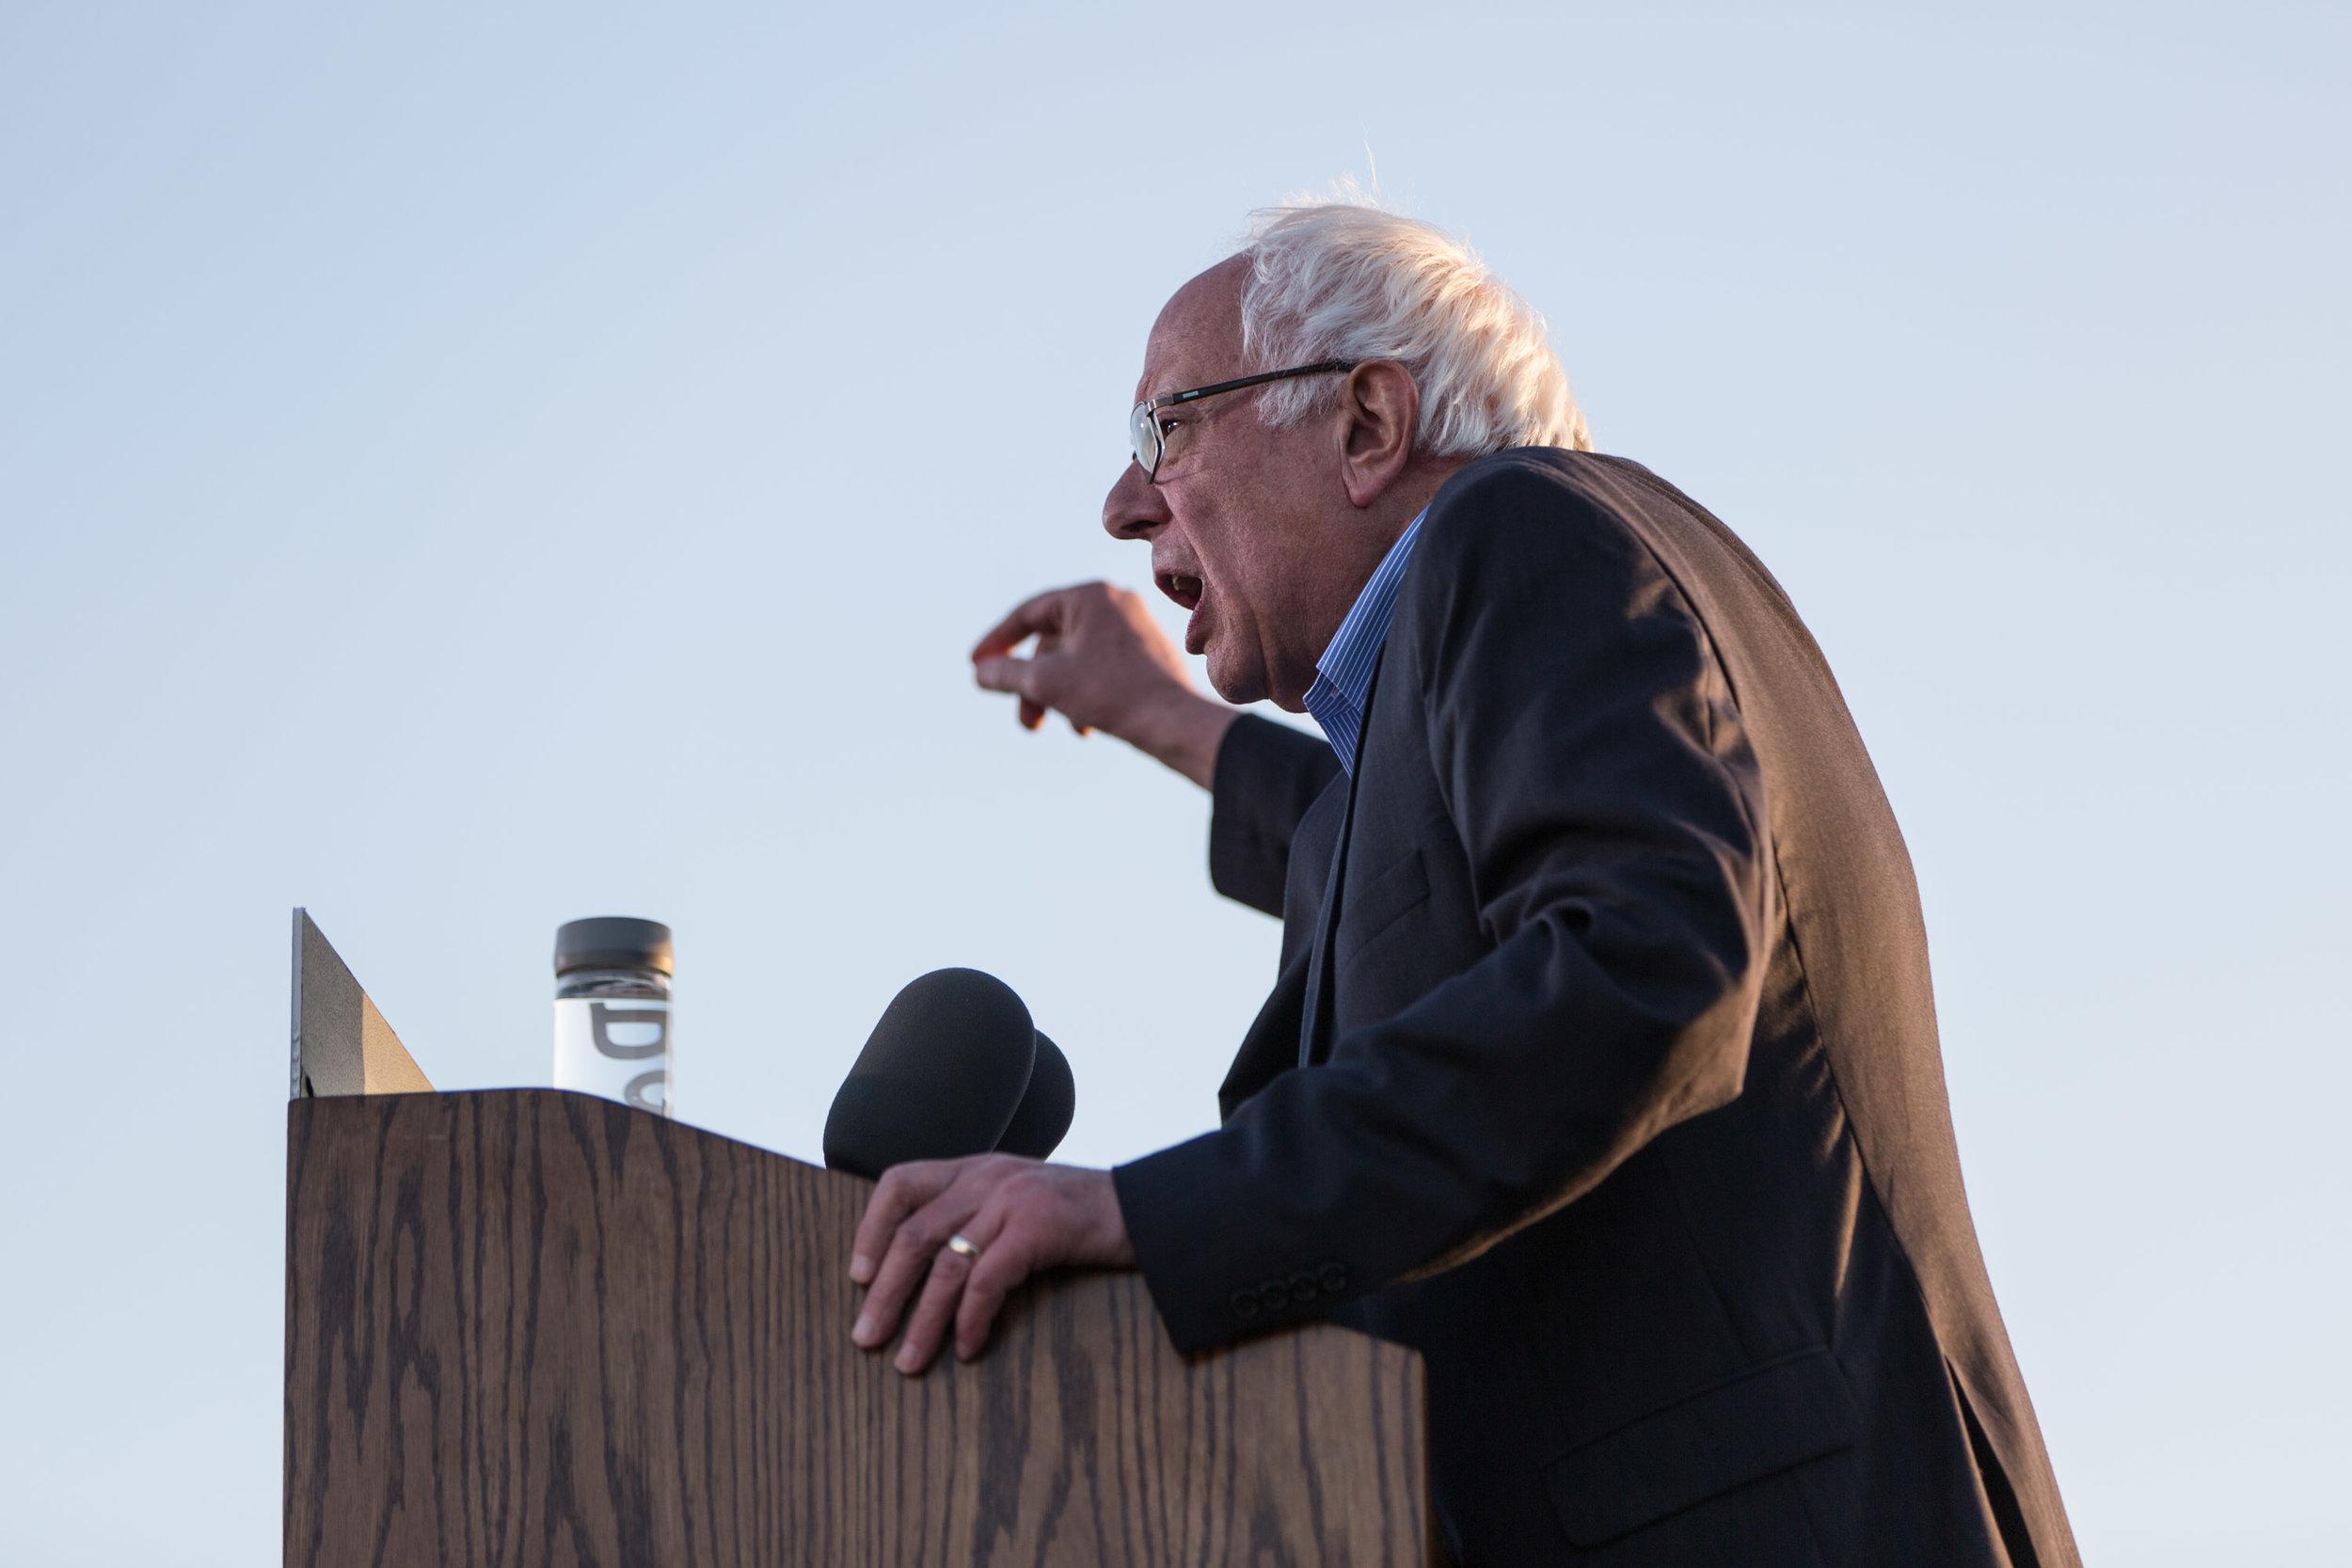 Bernie Sanders addresses a crowd in Vallejo, CA. May 2016.